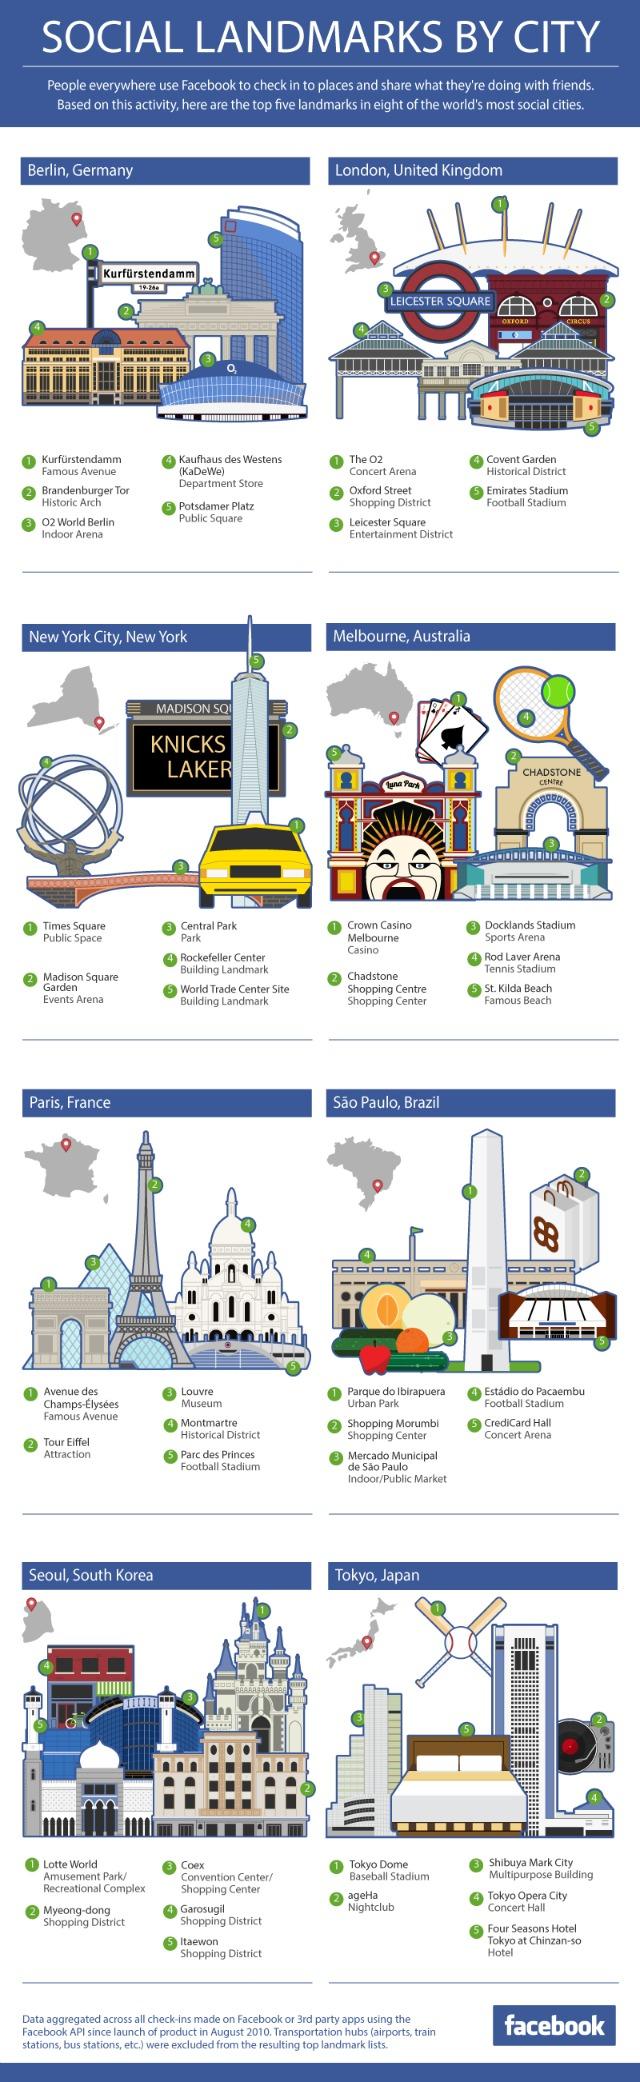 facebook check-ins social landmarks